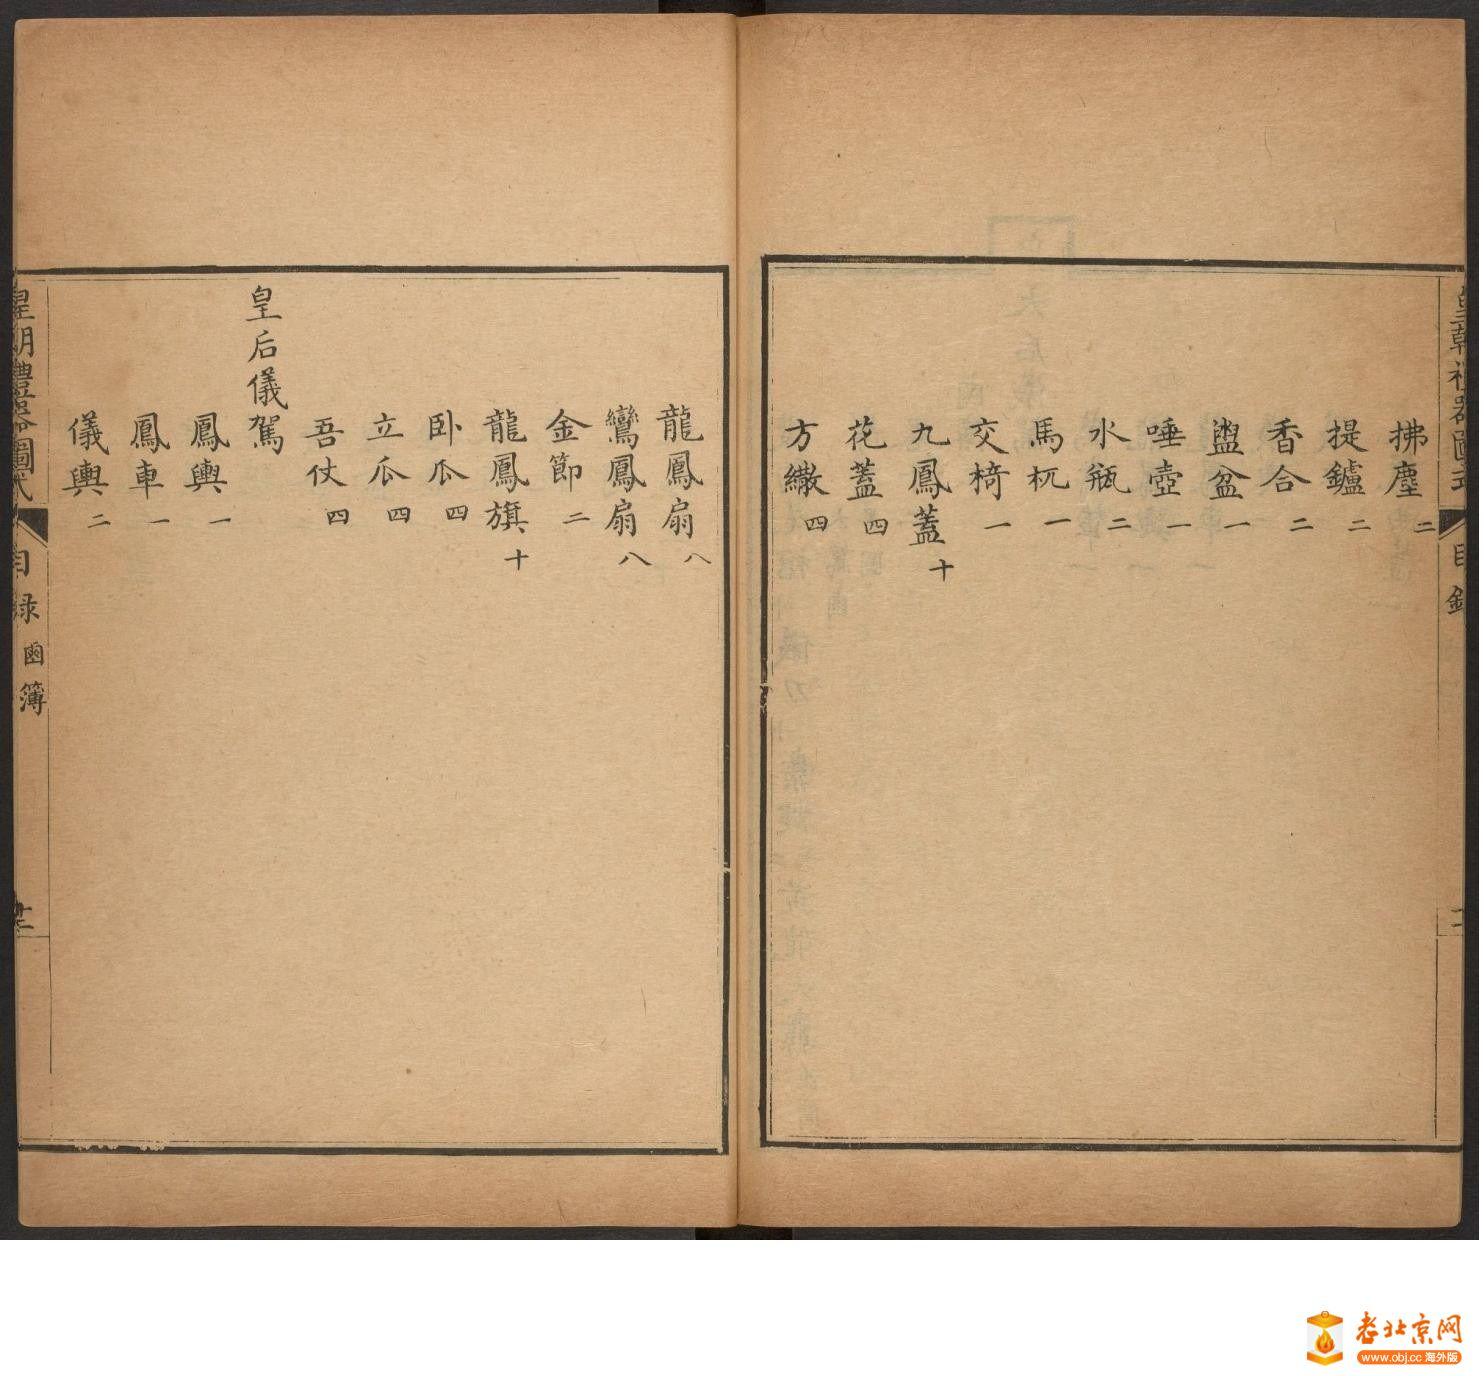 RE: 清皇朝礼器图式